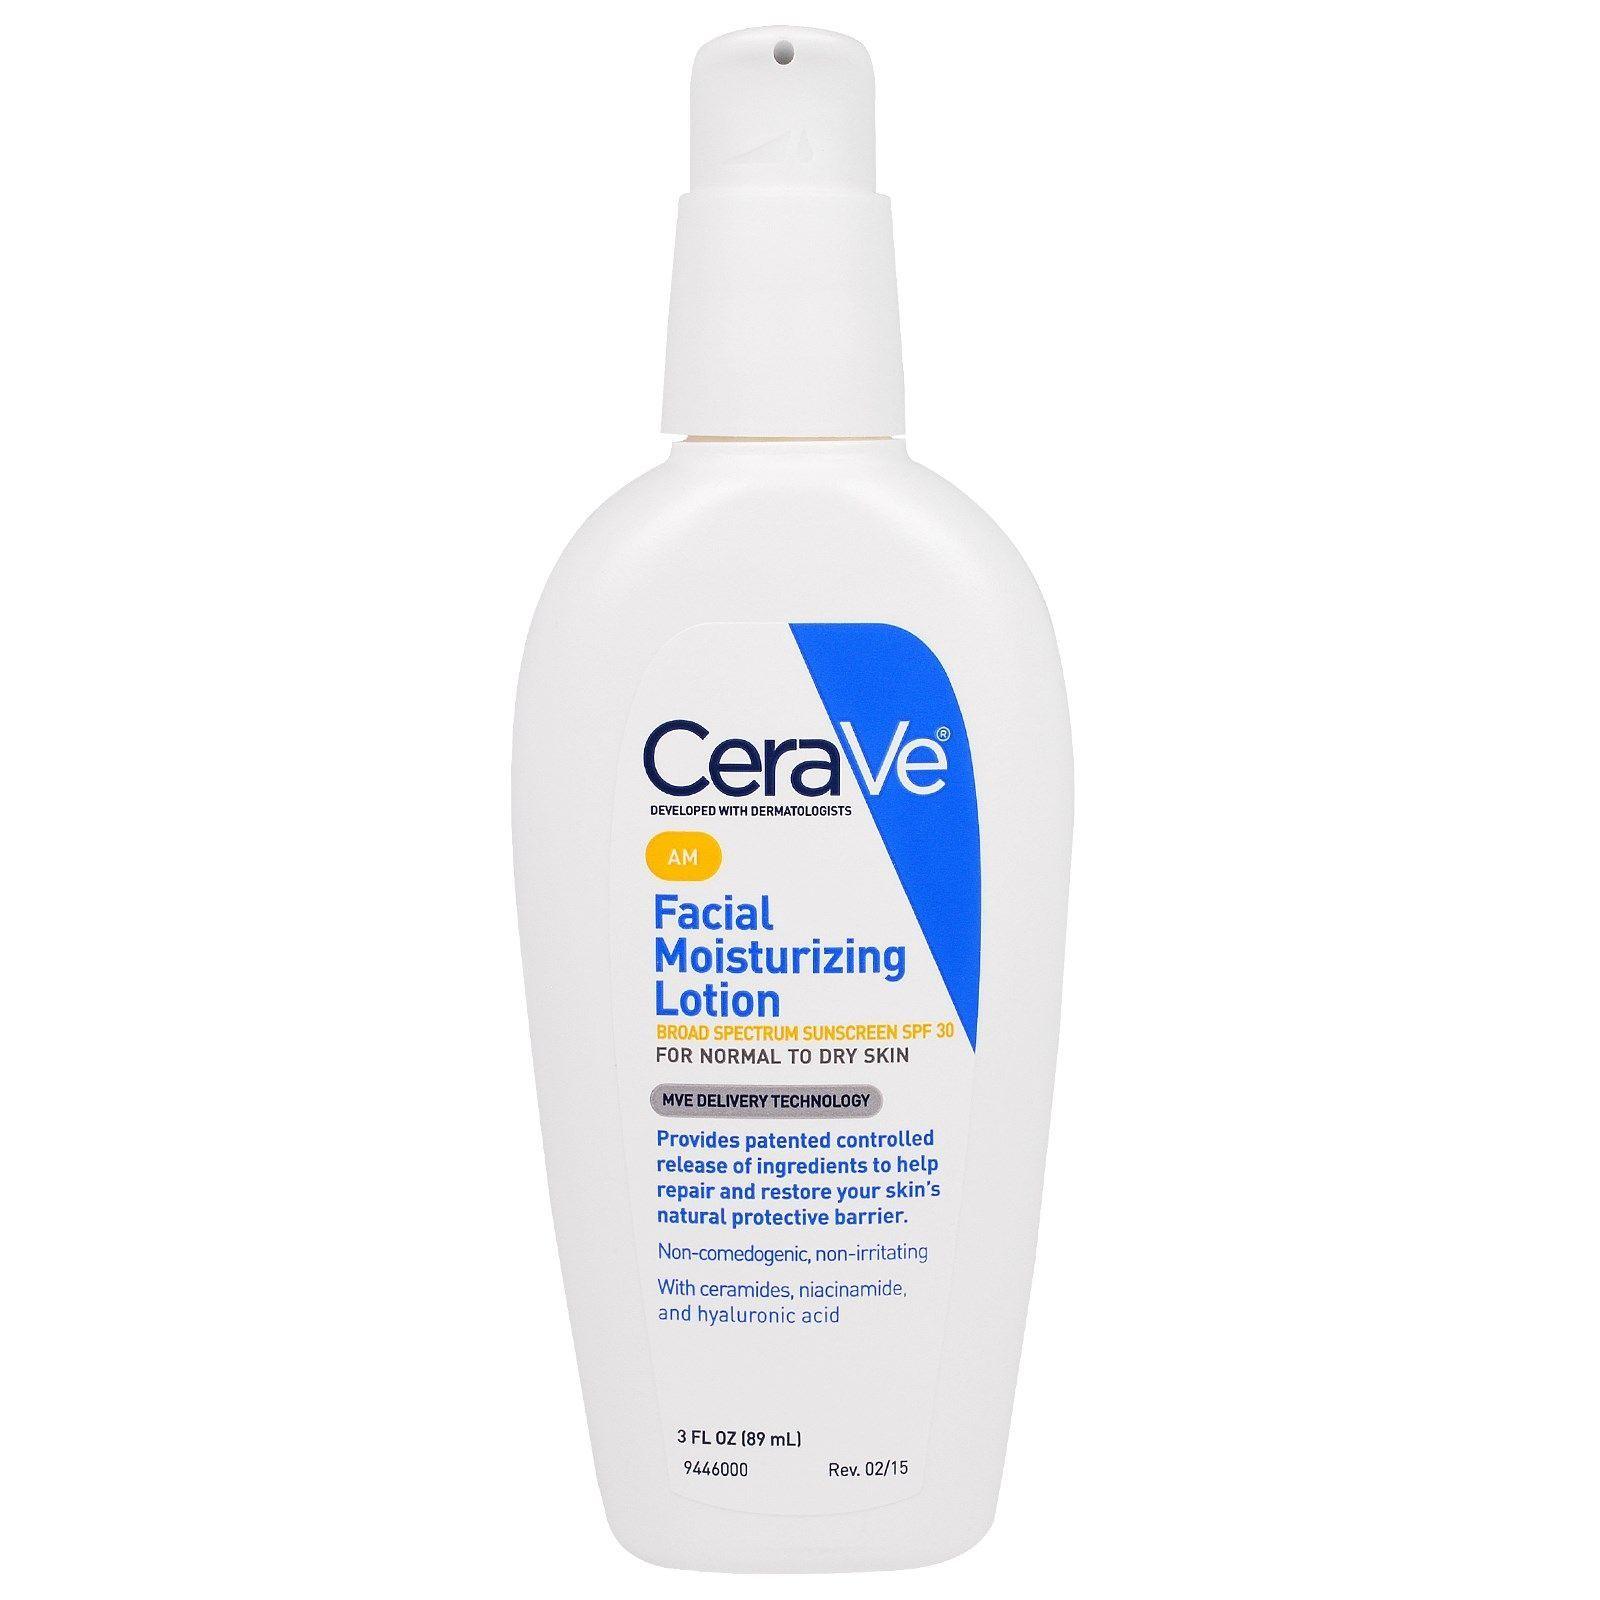 15 Sunscreens that Dermatologists Moisturizer